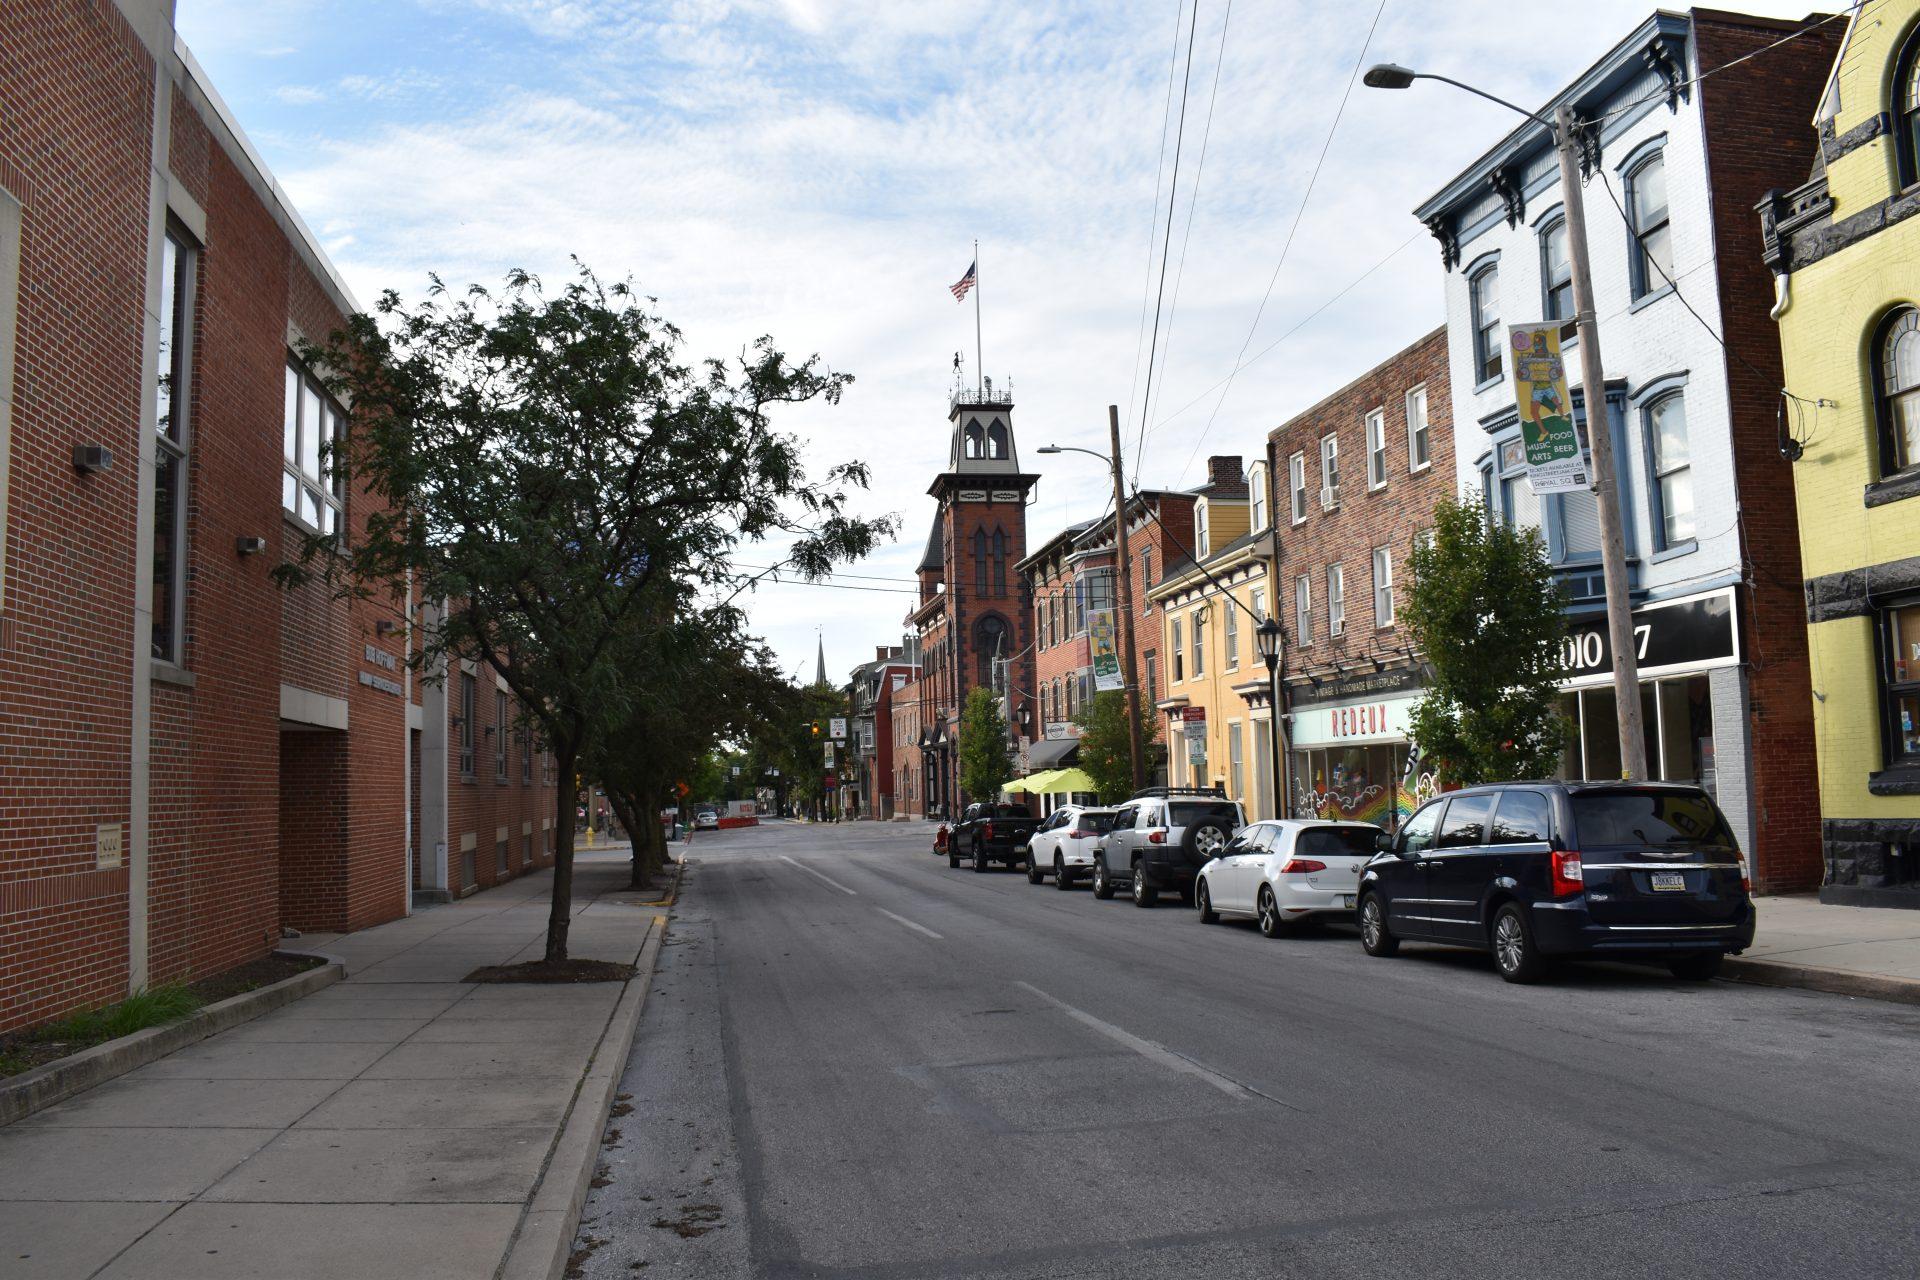 South Duke Street in York is seen on June 12, 2019.